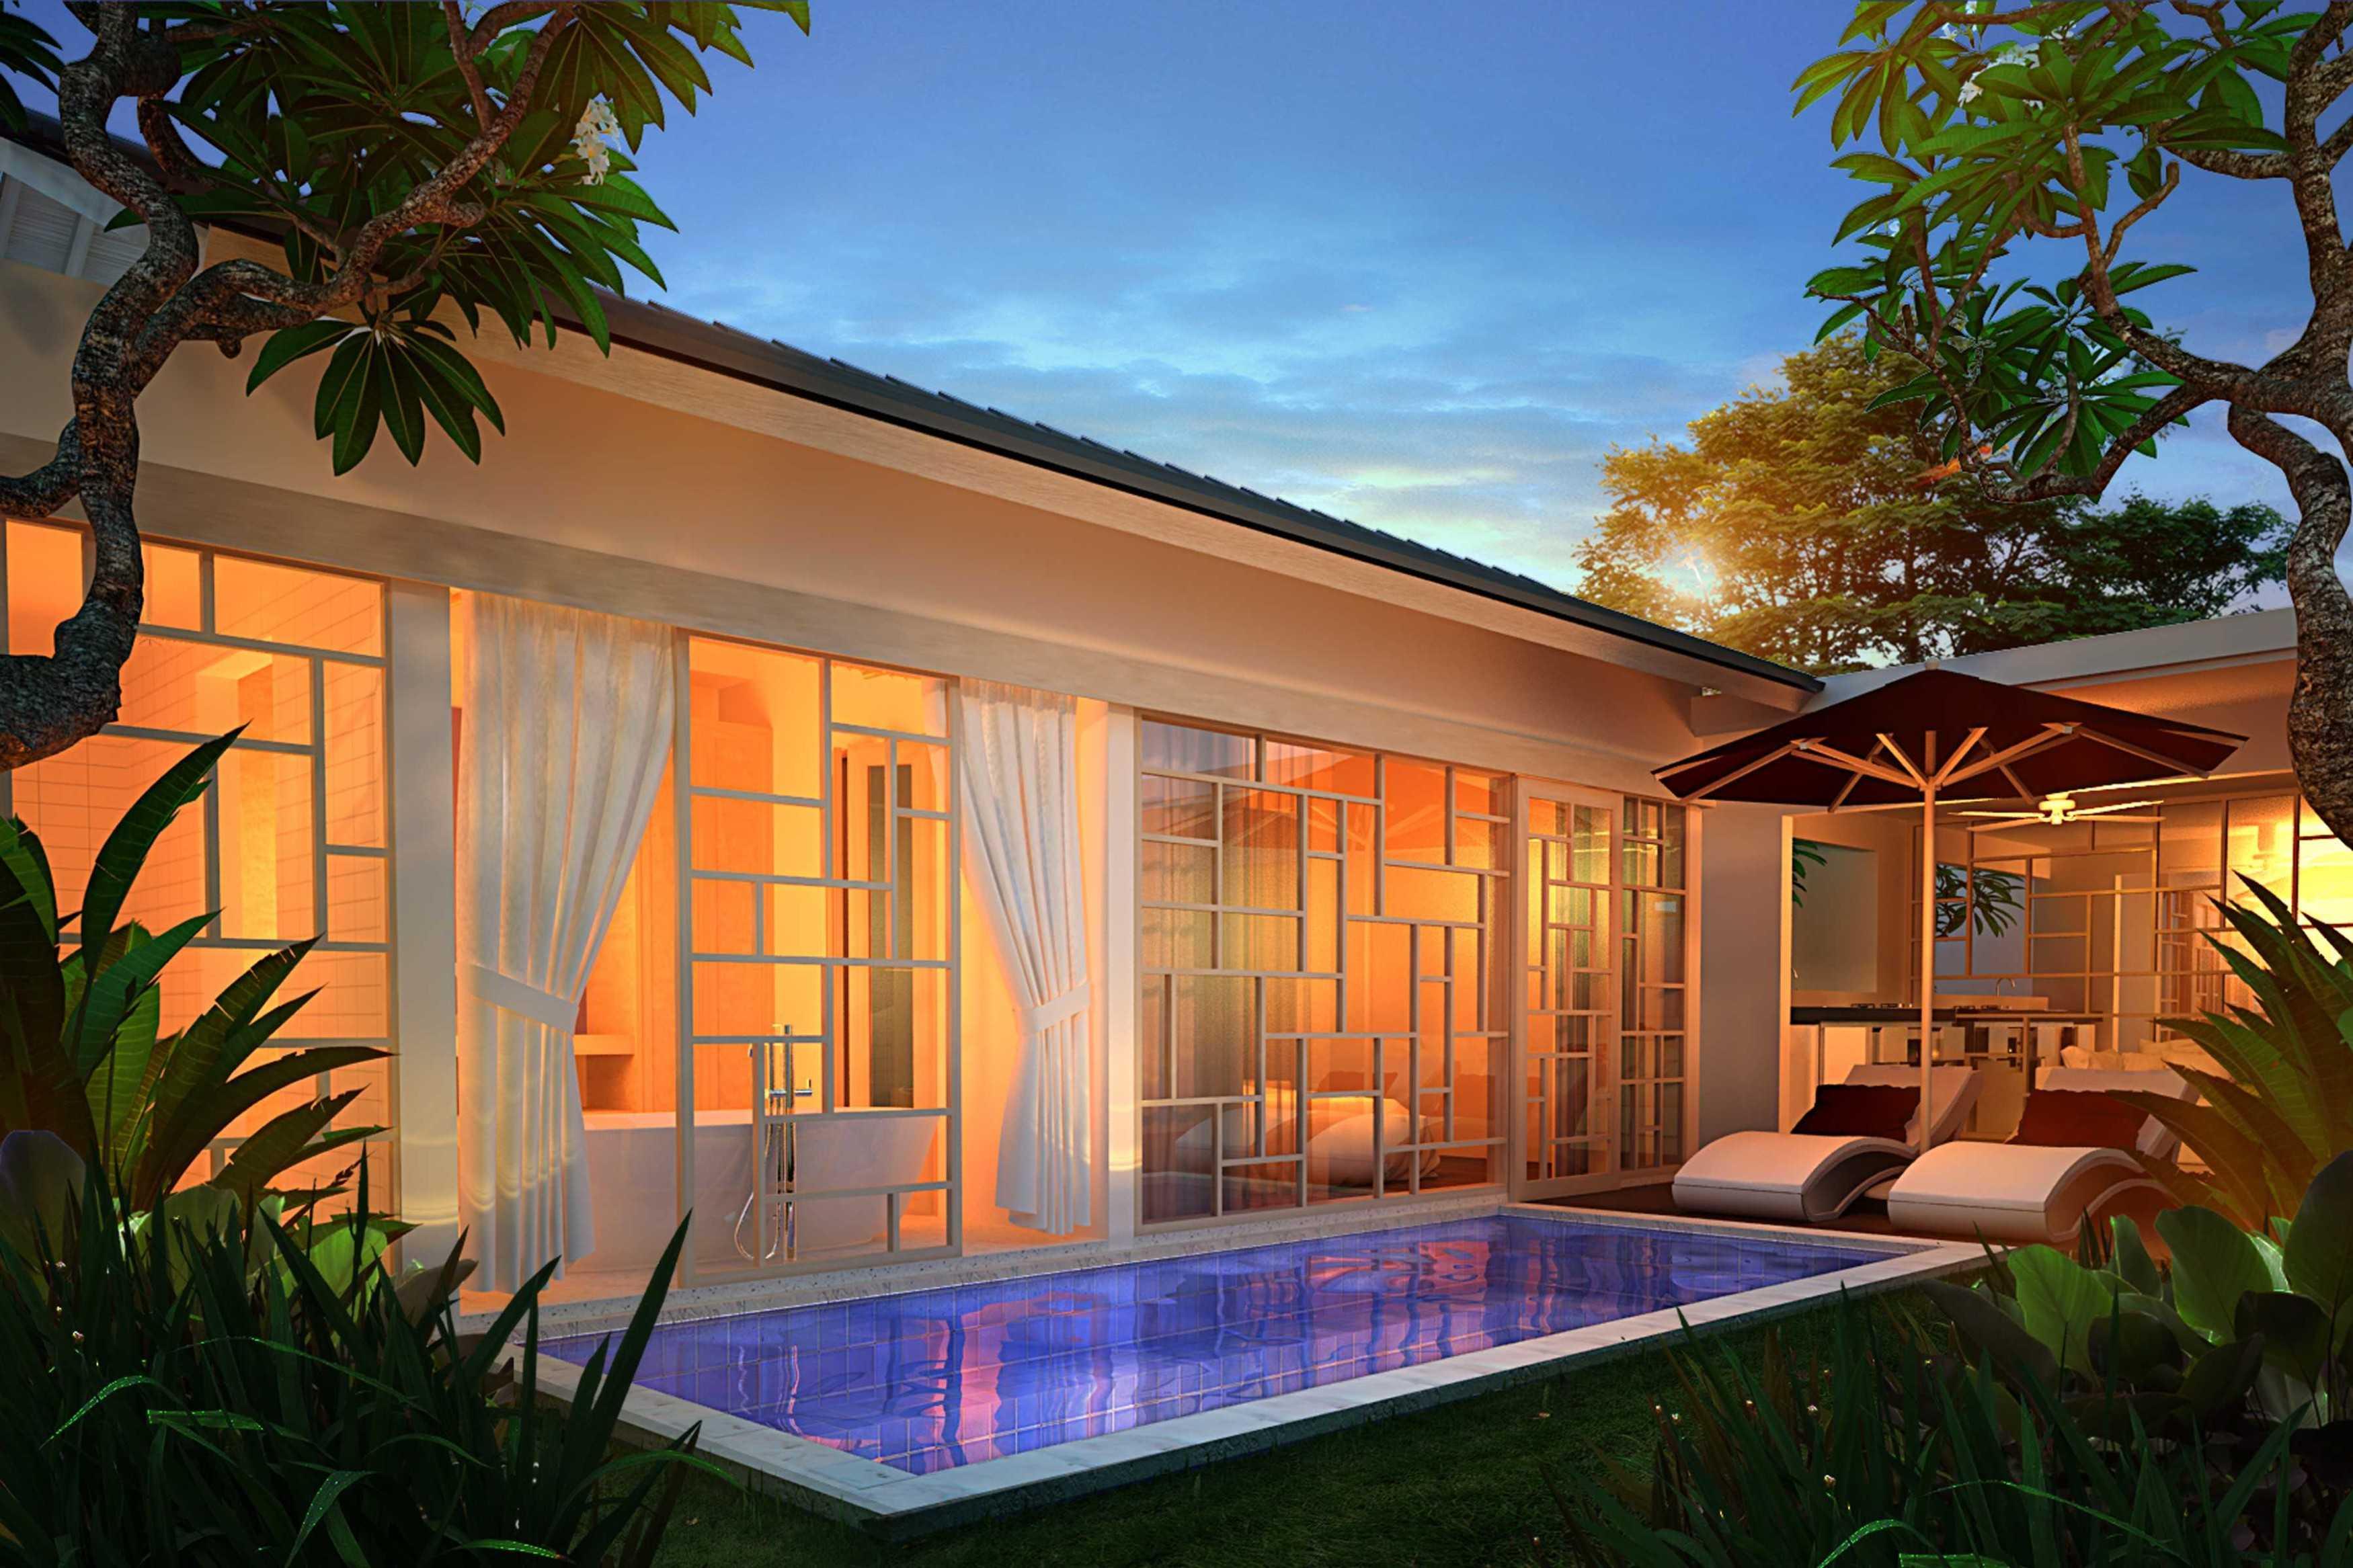 Made Dharmendra Architect Manca Canggu Villa Canggu, Kuta Utara, Kabupaten Badung, Bali, Indonesia Canggu, Kuta Utara, Kabupaten Badung, Bali, Indonesia Pool Area Kontemporer  49390